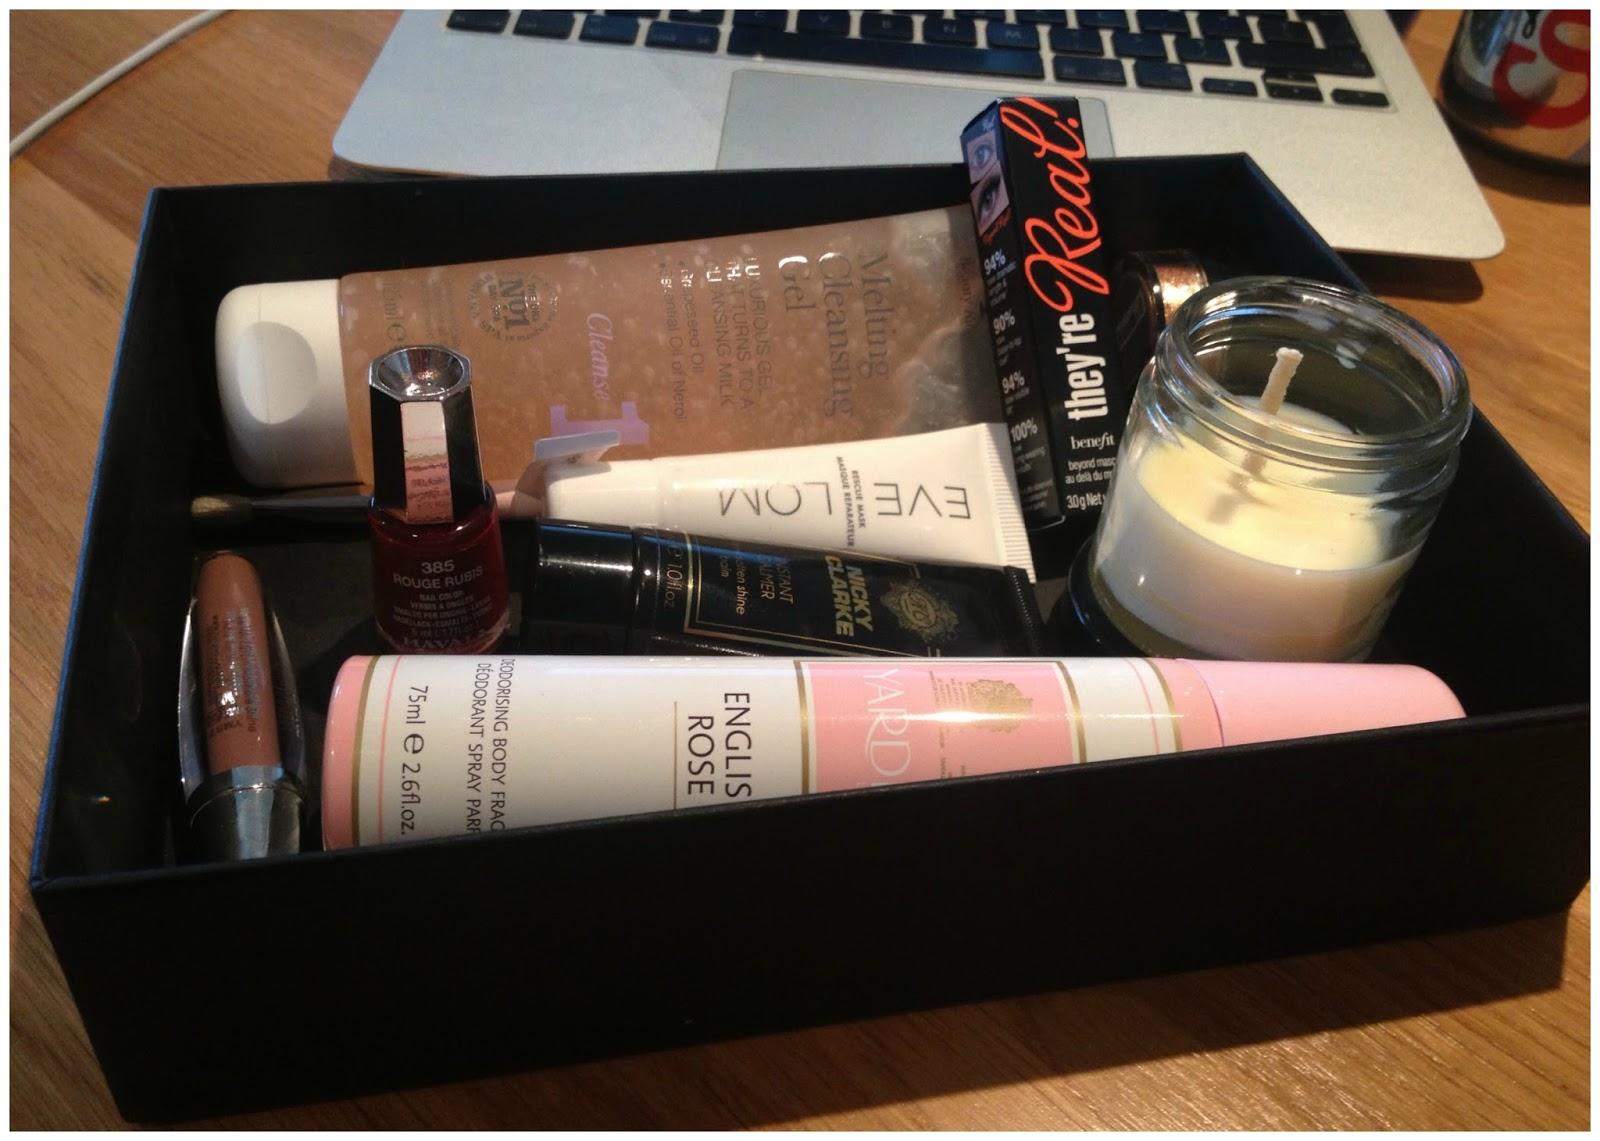 Latest in Beauty - Editors Picks - August 2013 | A ...